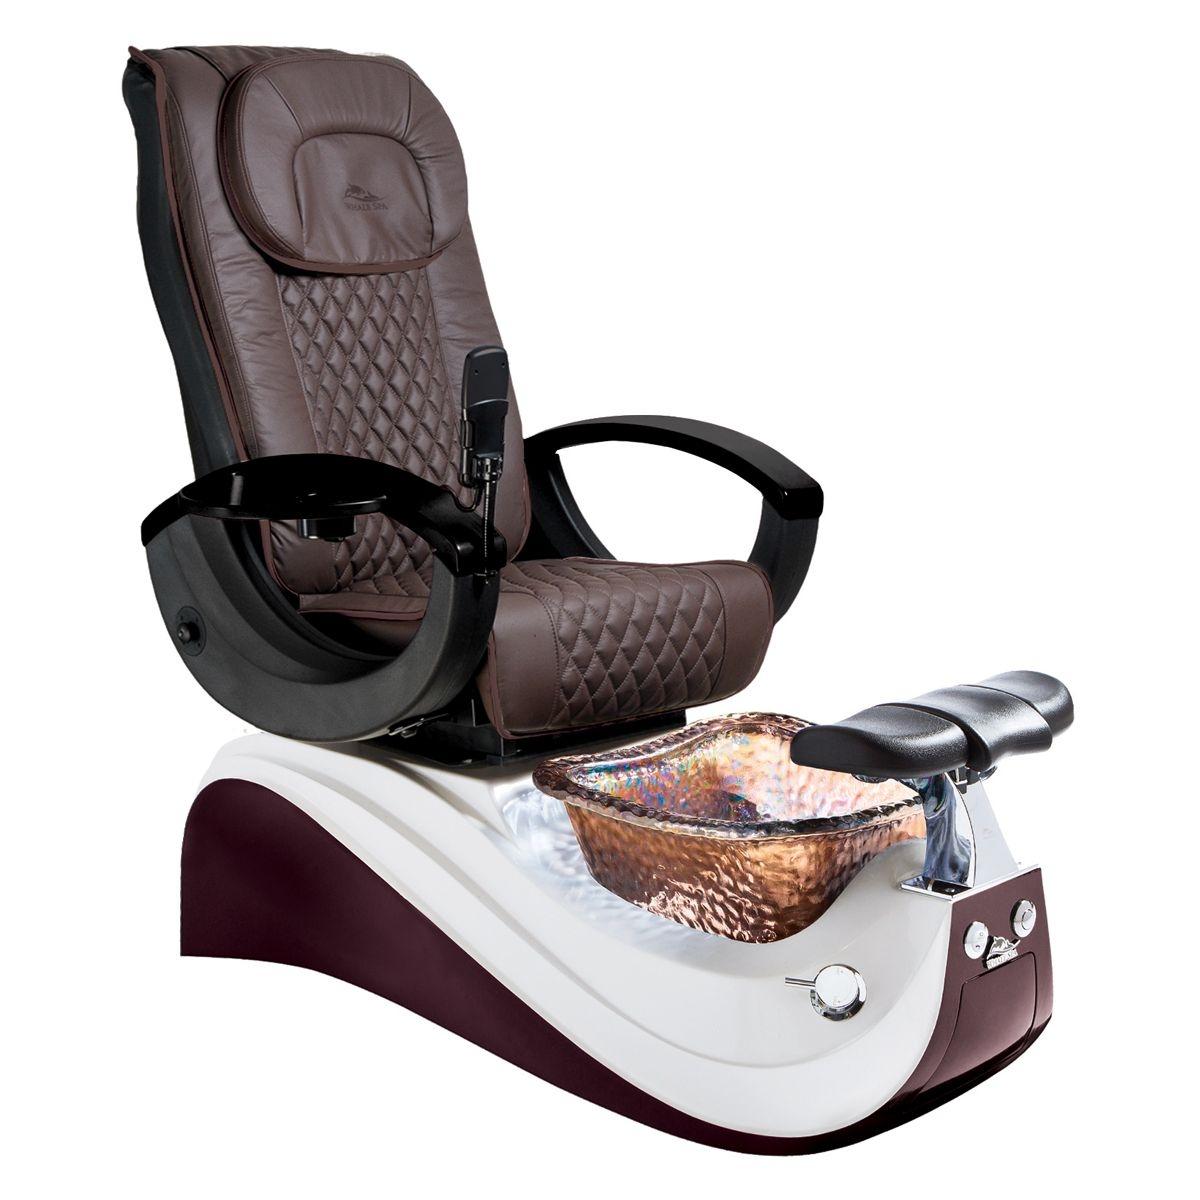 pedicura silla de masaje spa pedicura silla de spa pie